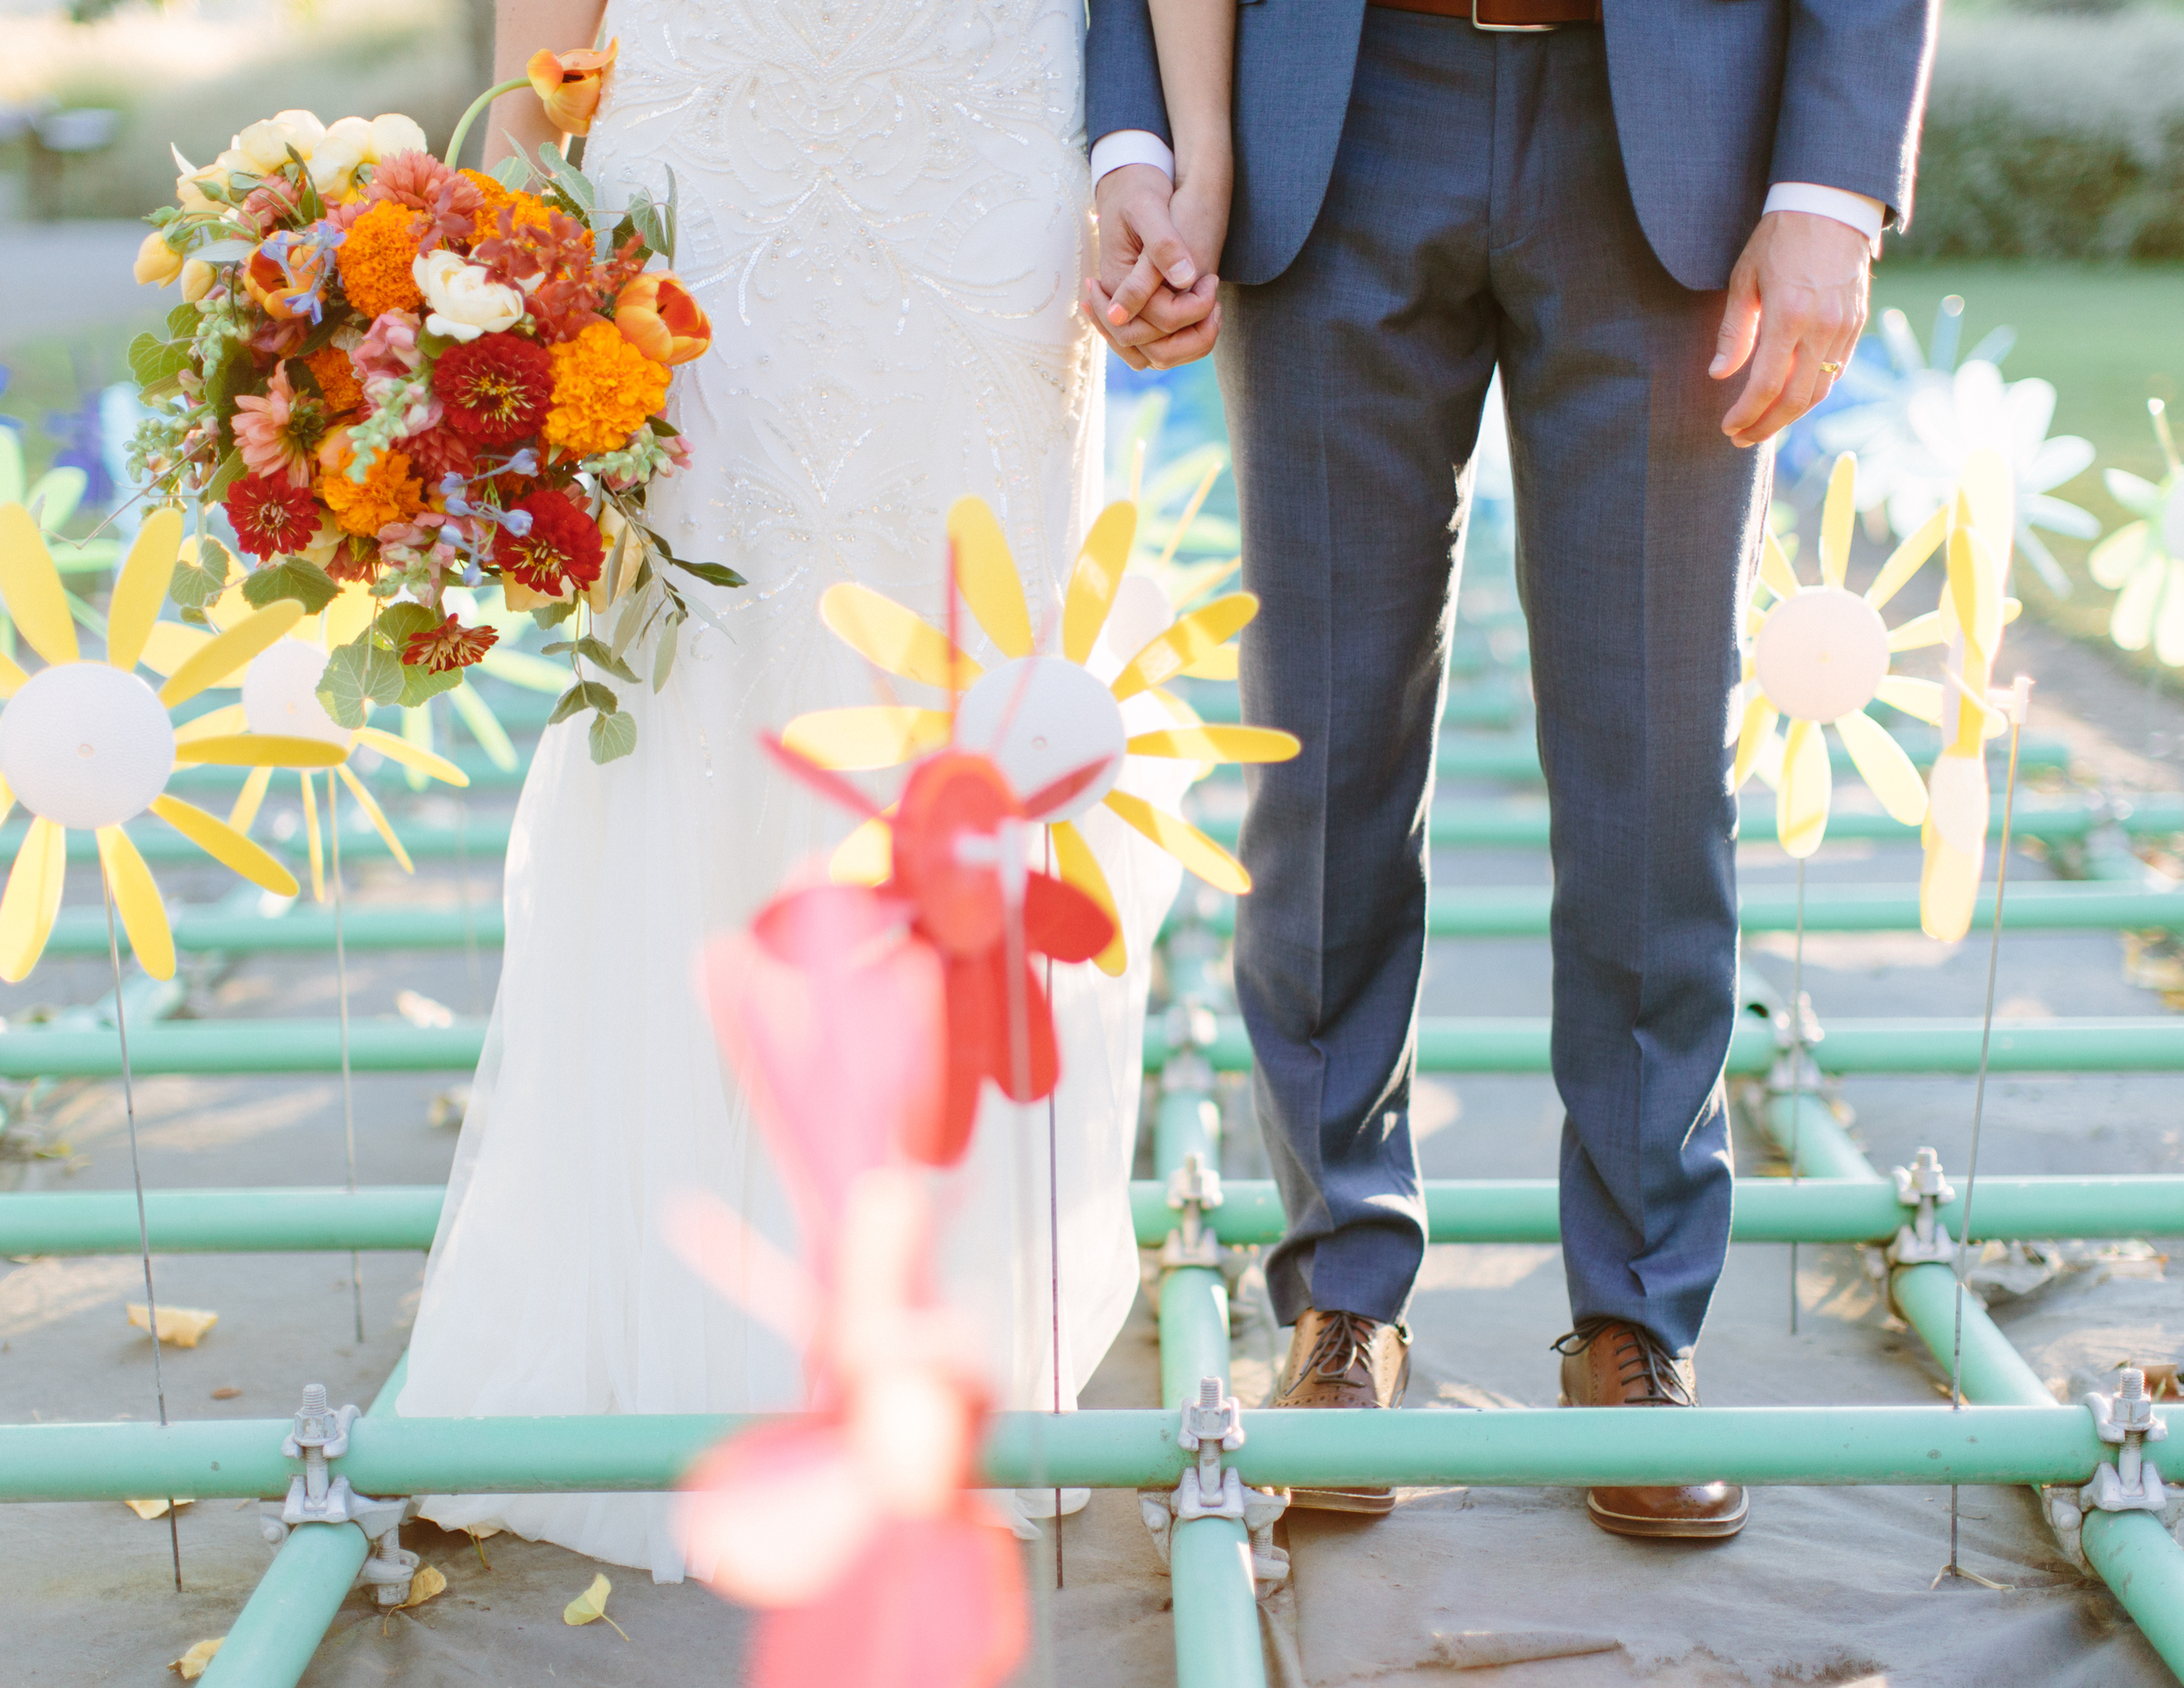 cornerstone sonoma wedding 1.jpg